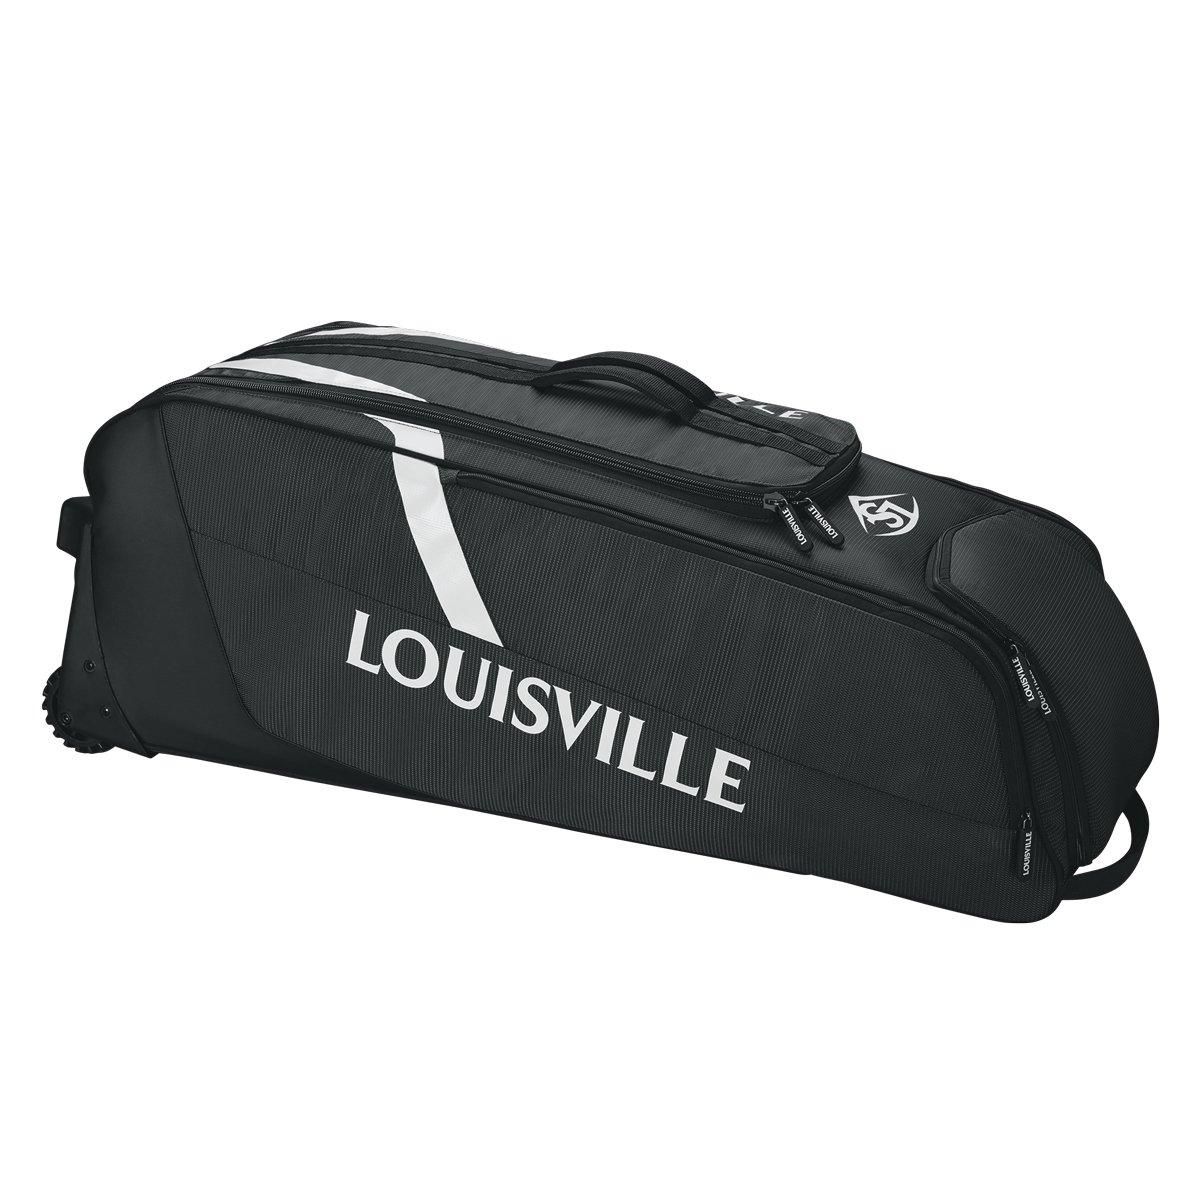 Louisville Slugger(ルイスビルスラッガー) 野球用 キャリーバック SELECT RIG WHEELED BAG WTL9701 B0741JFMKMブラック